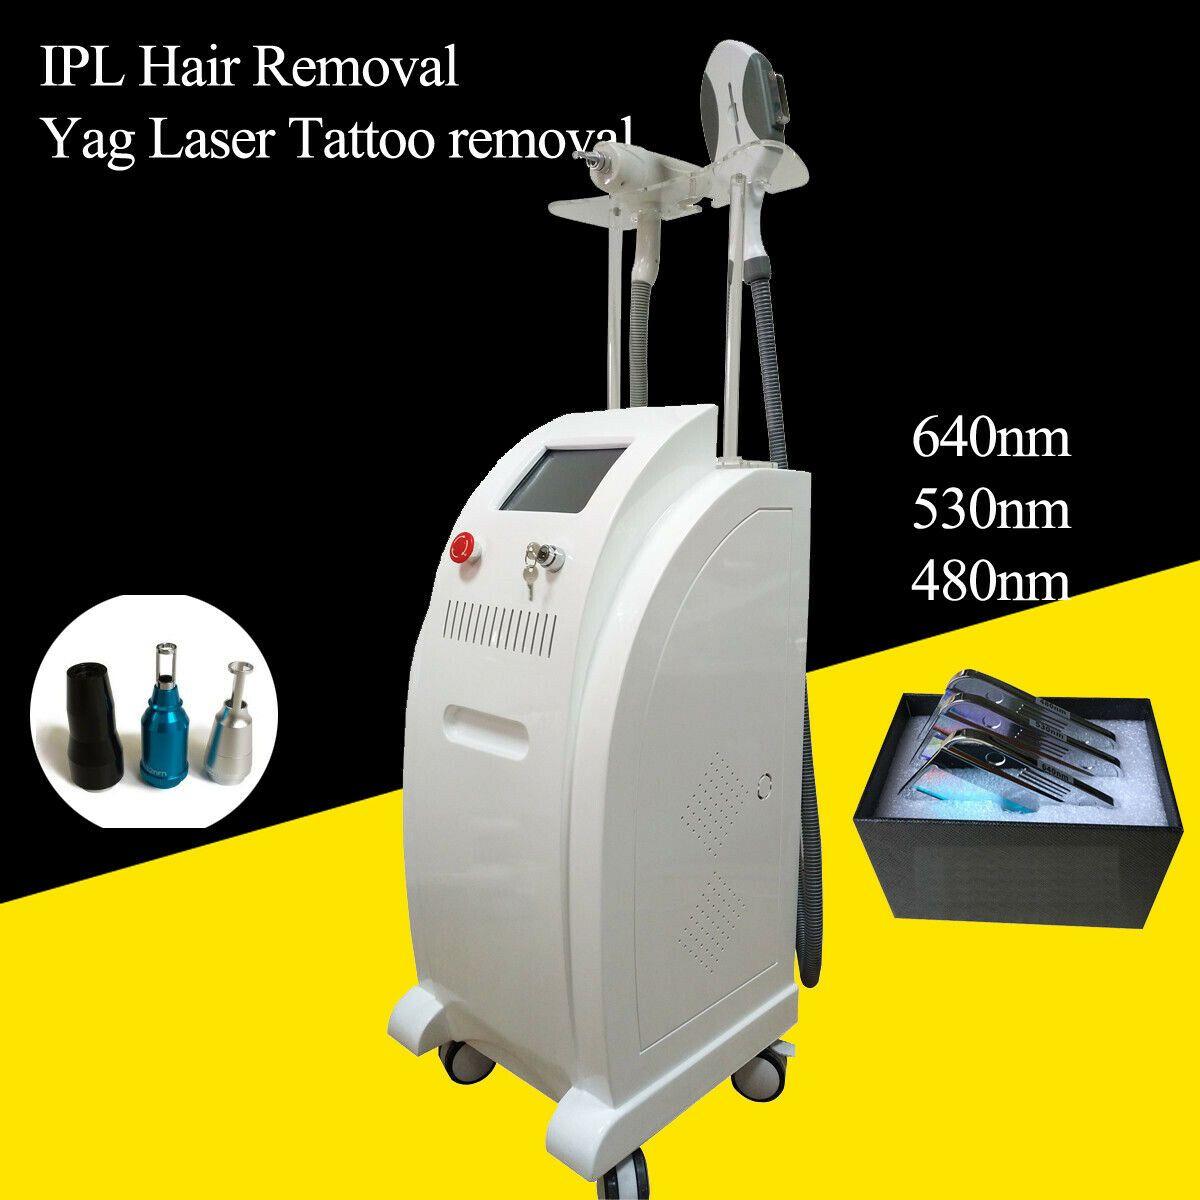 Yag Laser Hair Removal in 2020 Yag laser, Laser hair